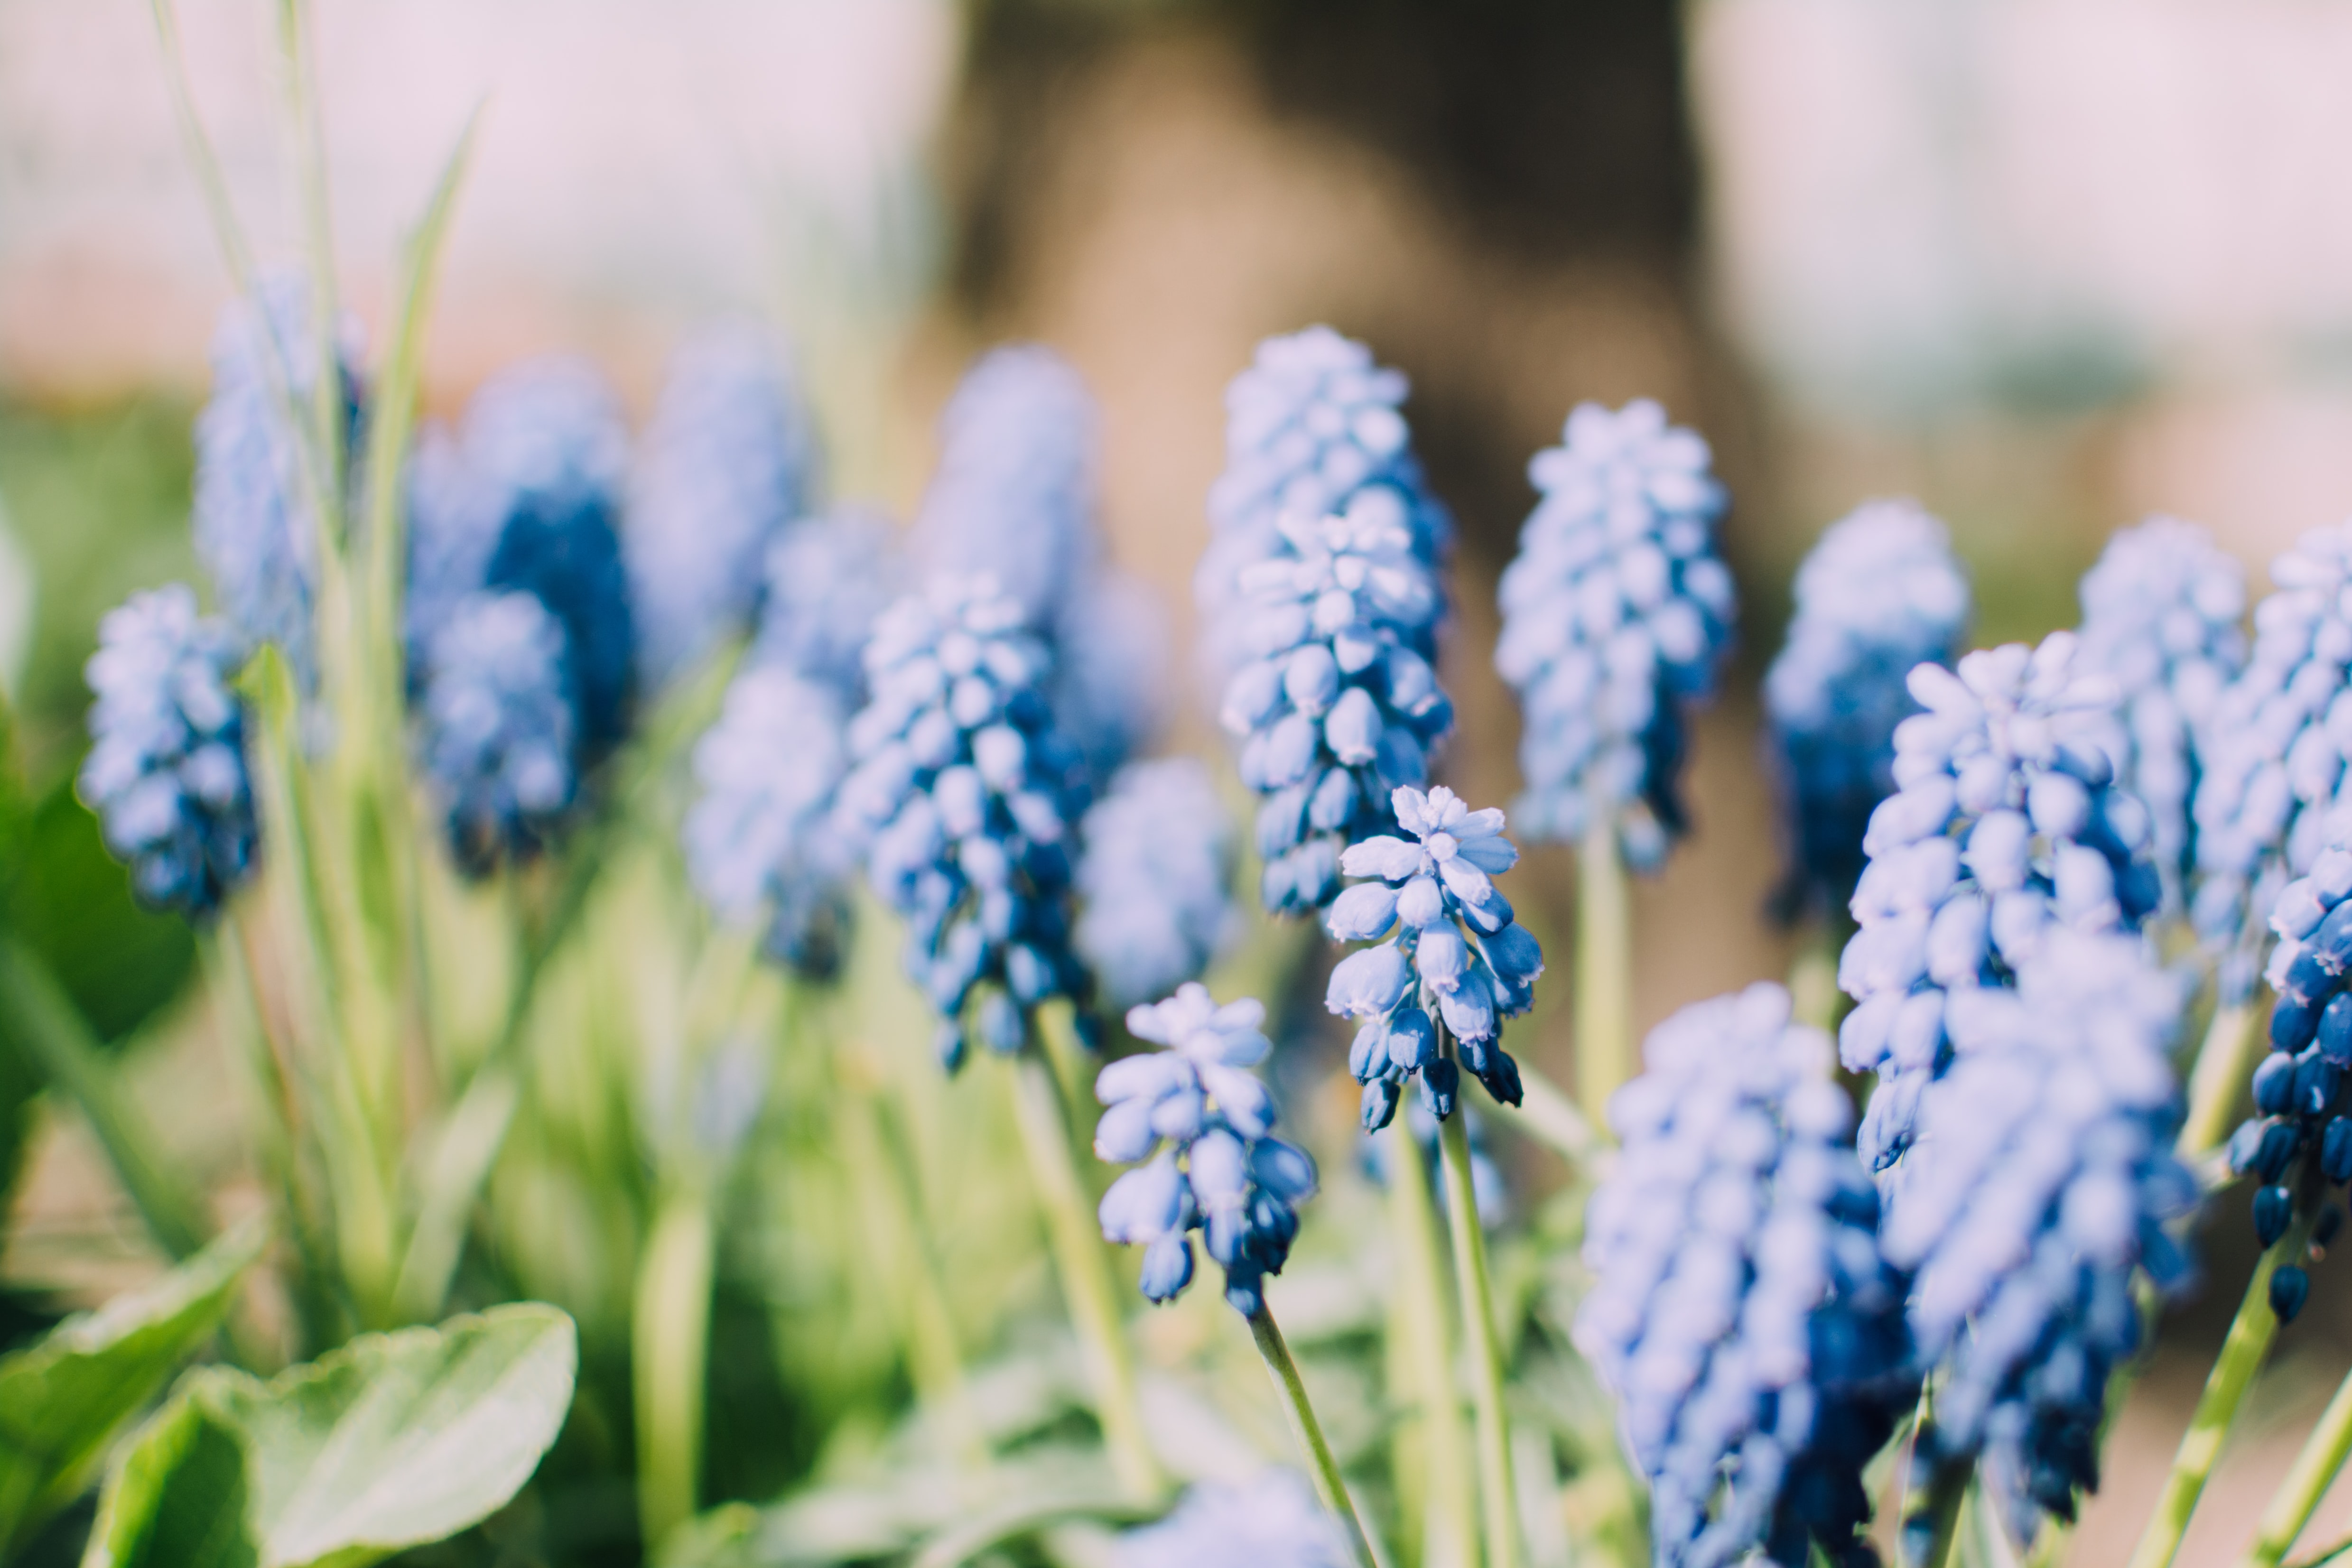 Distinctive blue flowers with green stems in garden in Spring